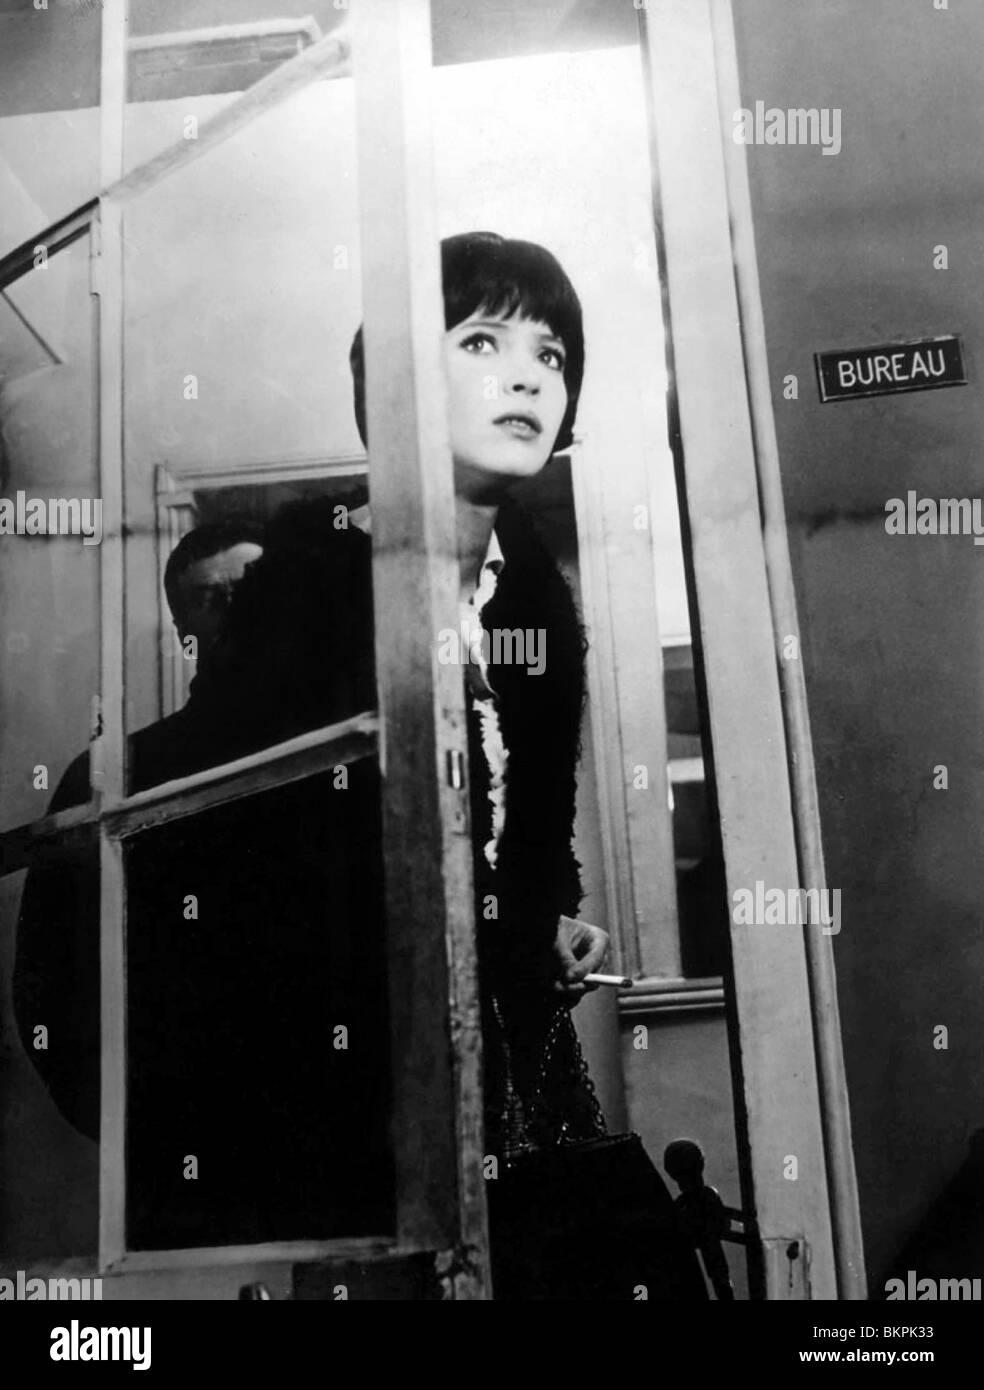 VIVRE SA VIE (1962) IT'S MY LIFE (ALT) MY LIFE TO LIVE (ALT) ANNA KARINA JEAN-LUC GODARD (DIR) VIVR 004 - Stock Image